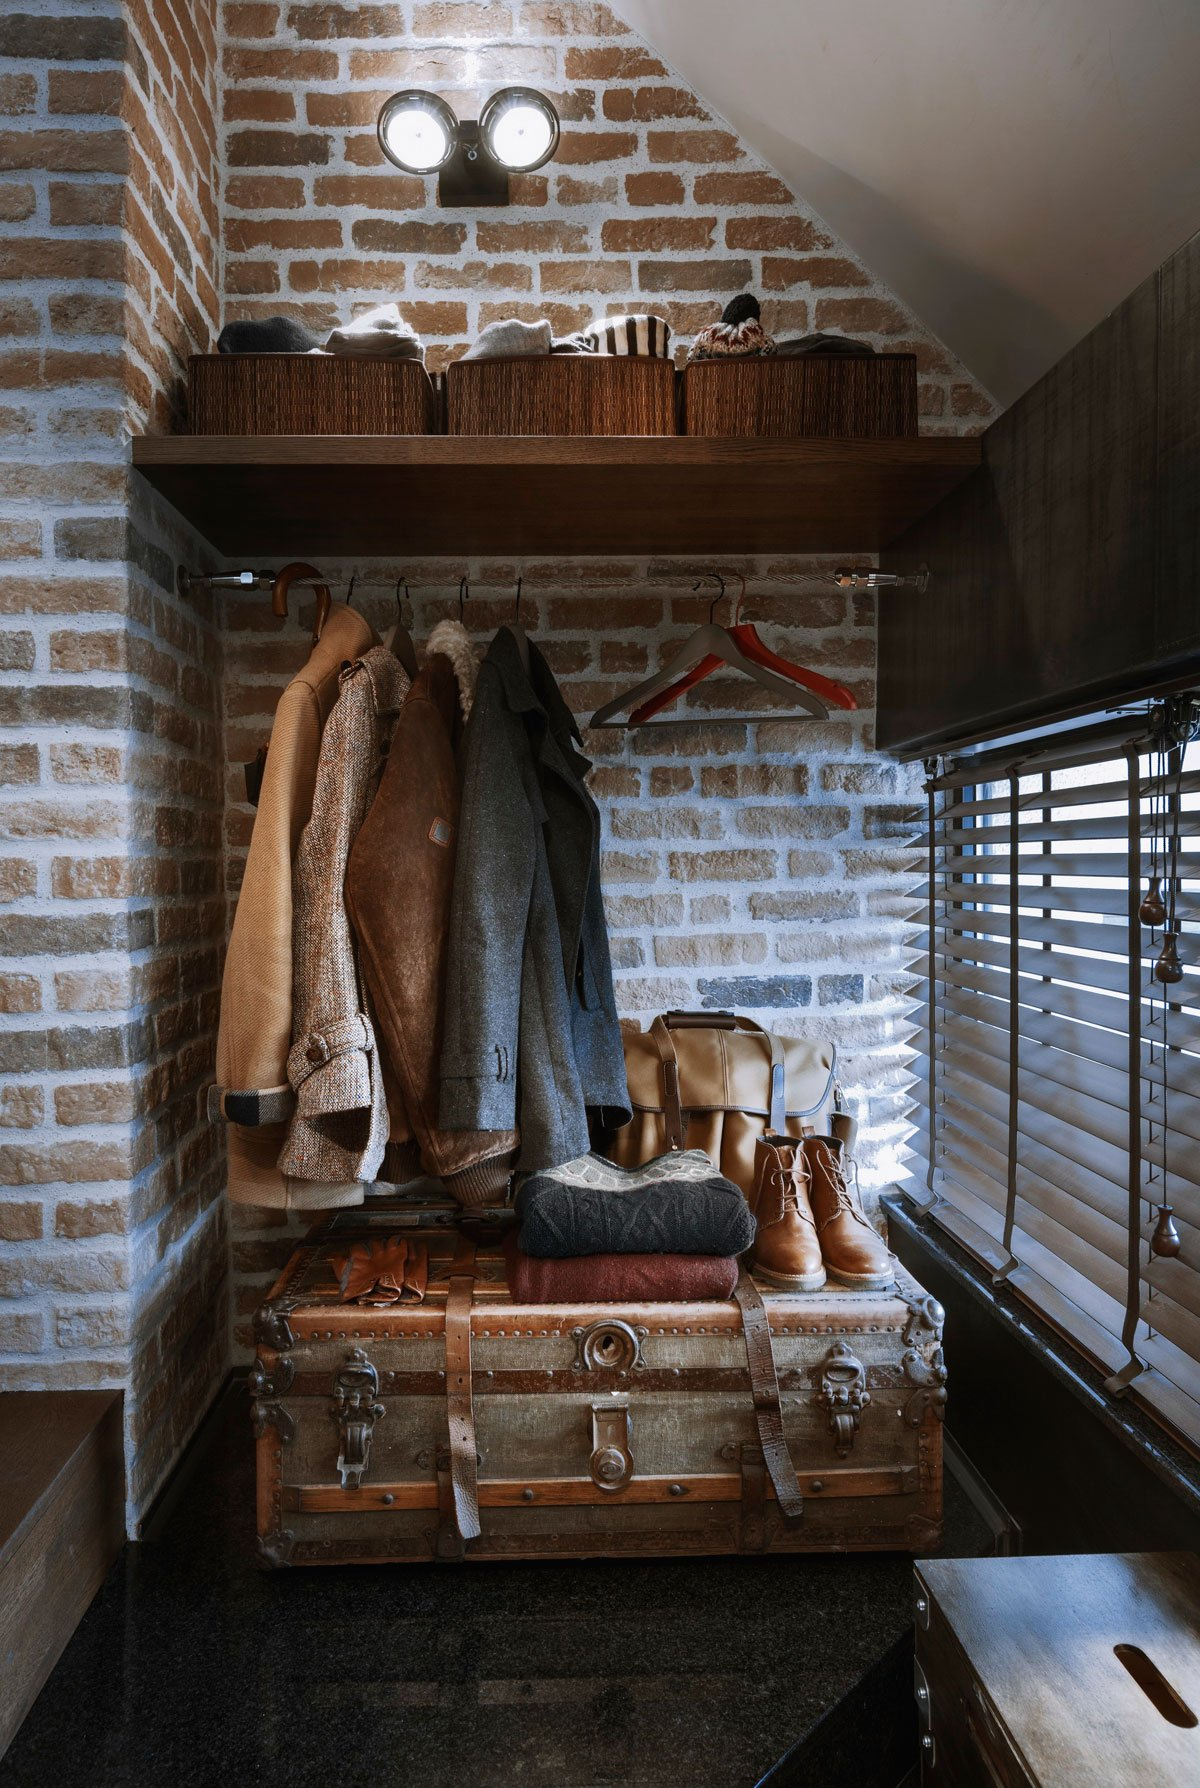 Loft 9b, Dimitar Karanikolov, Димитар Караниколов, лофт в Болгарии фото, частные дома в Болгарии фото, элитные дома в Болгарии фото